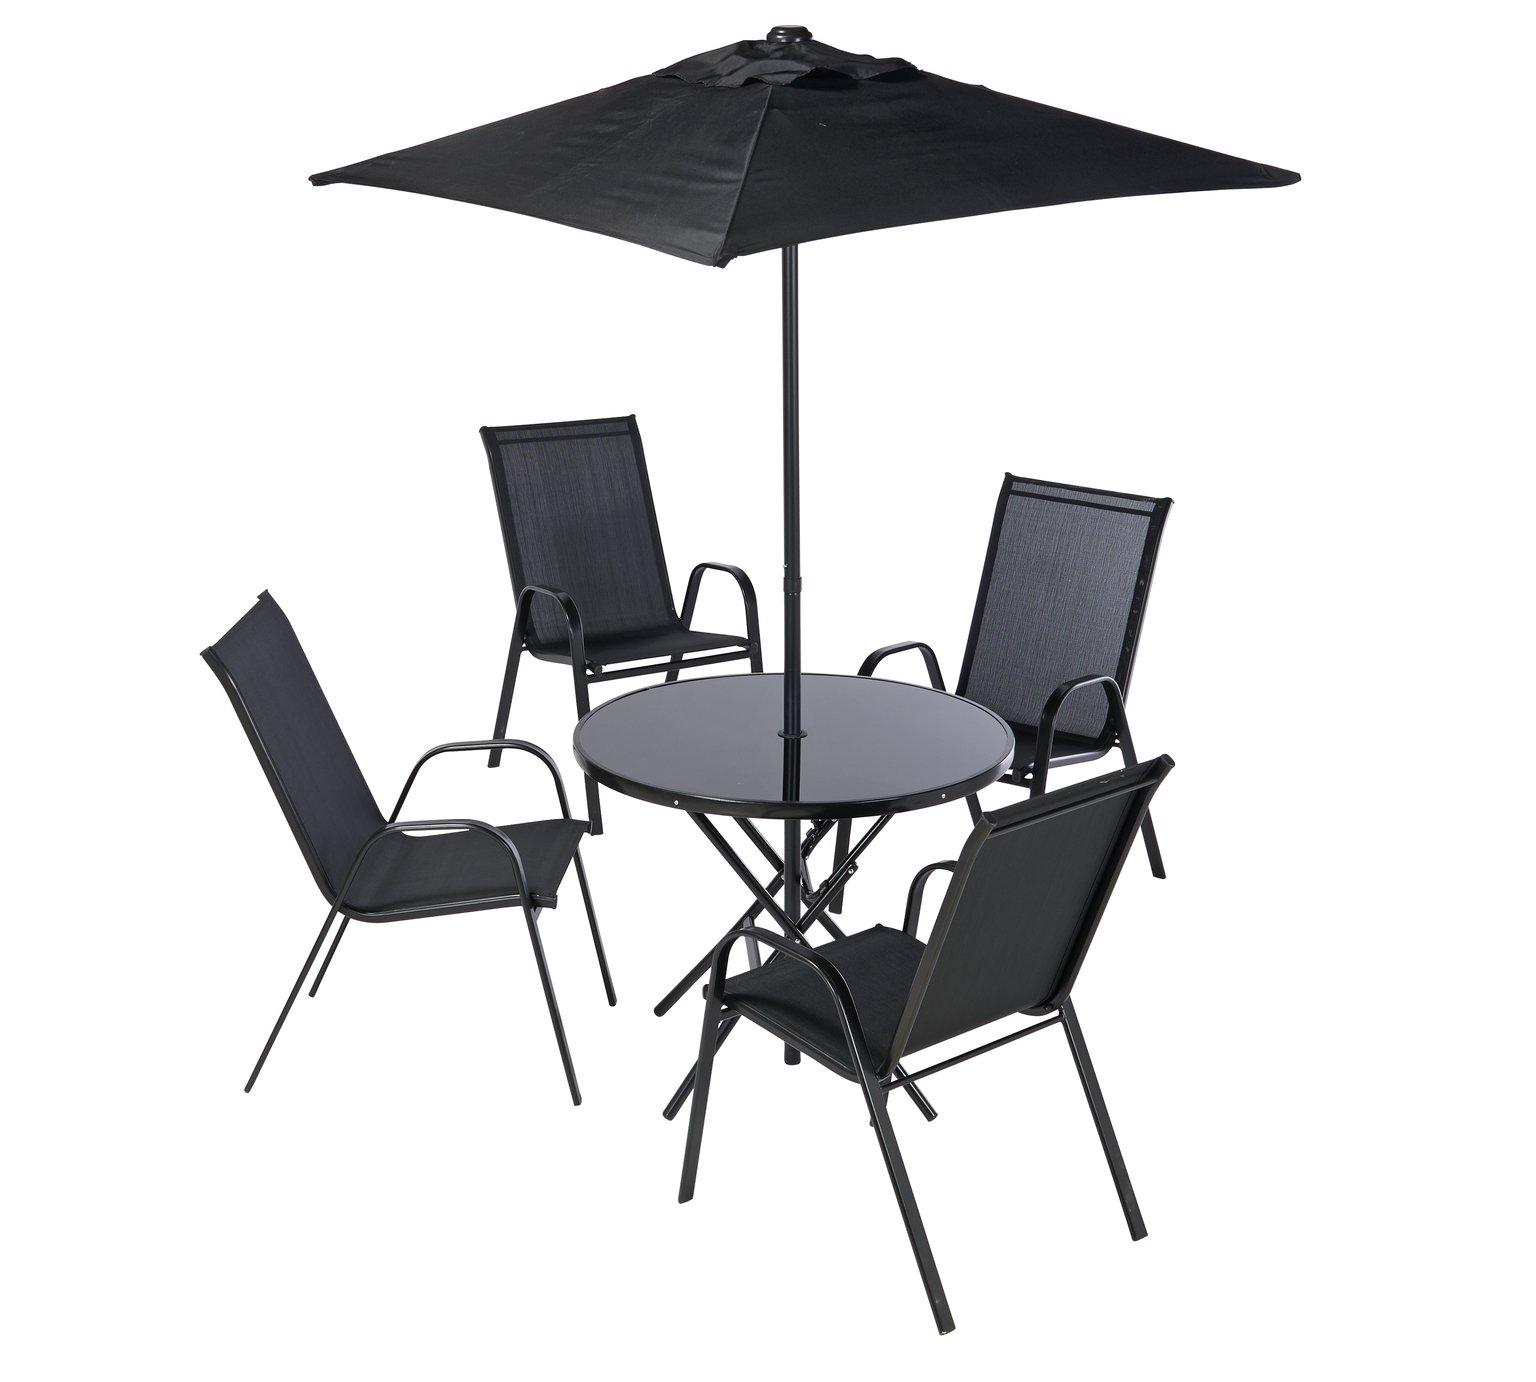 Sicily Garden Furniture Home sicily 4 seater patio set 10499 at argos hotukdeals home sicily 4 seater patio set 10499 at argos workwithnaturefo